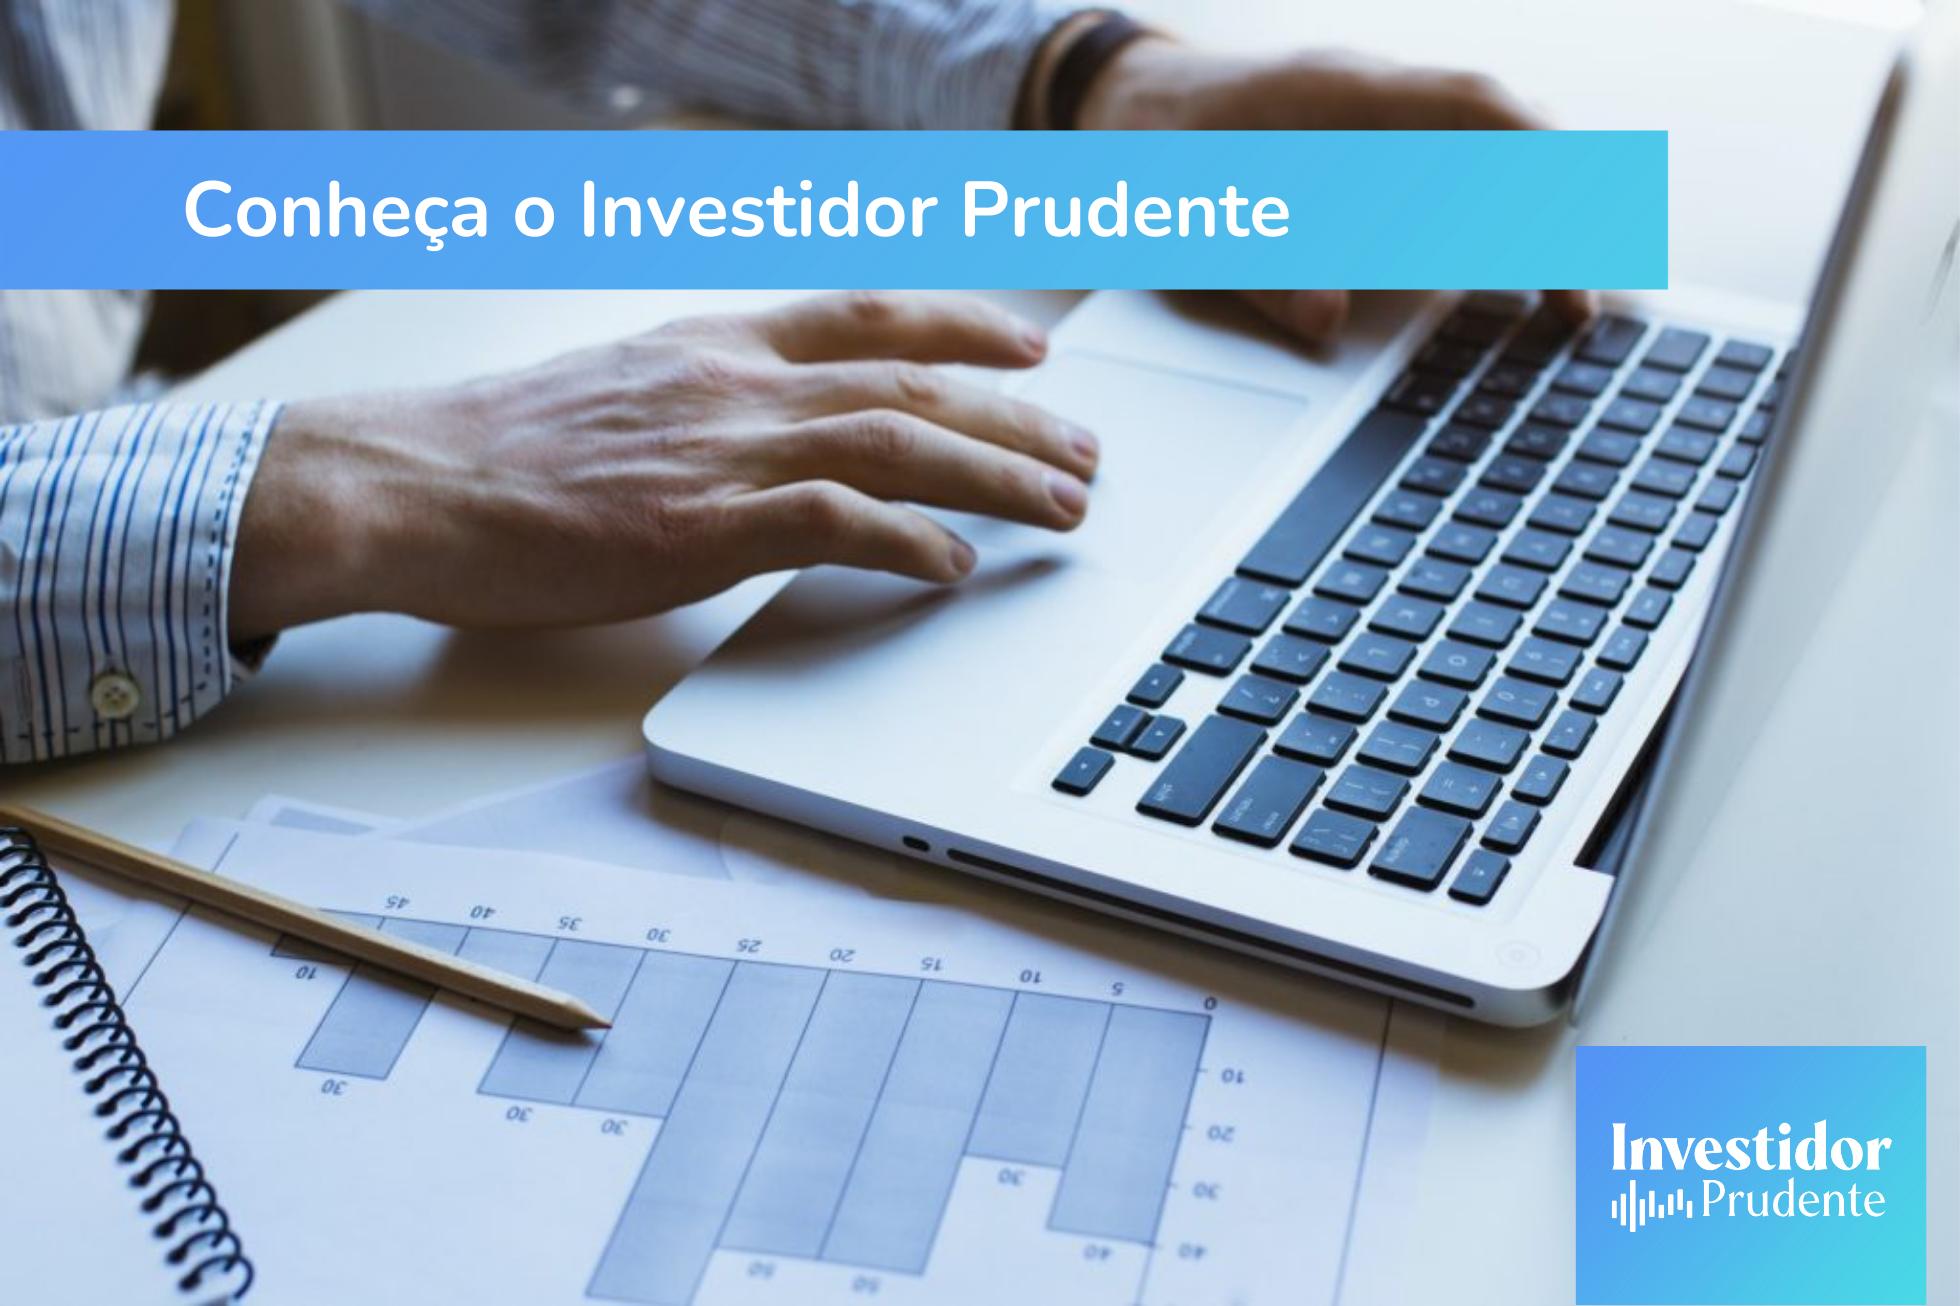 Conheça o Investidor Prudente